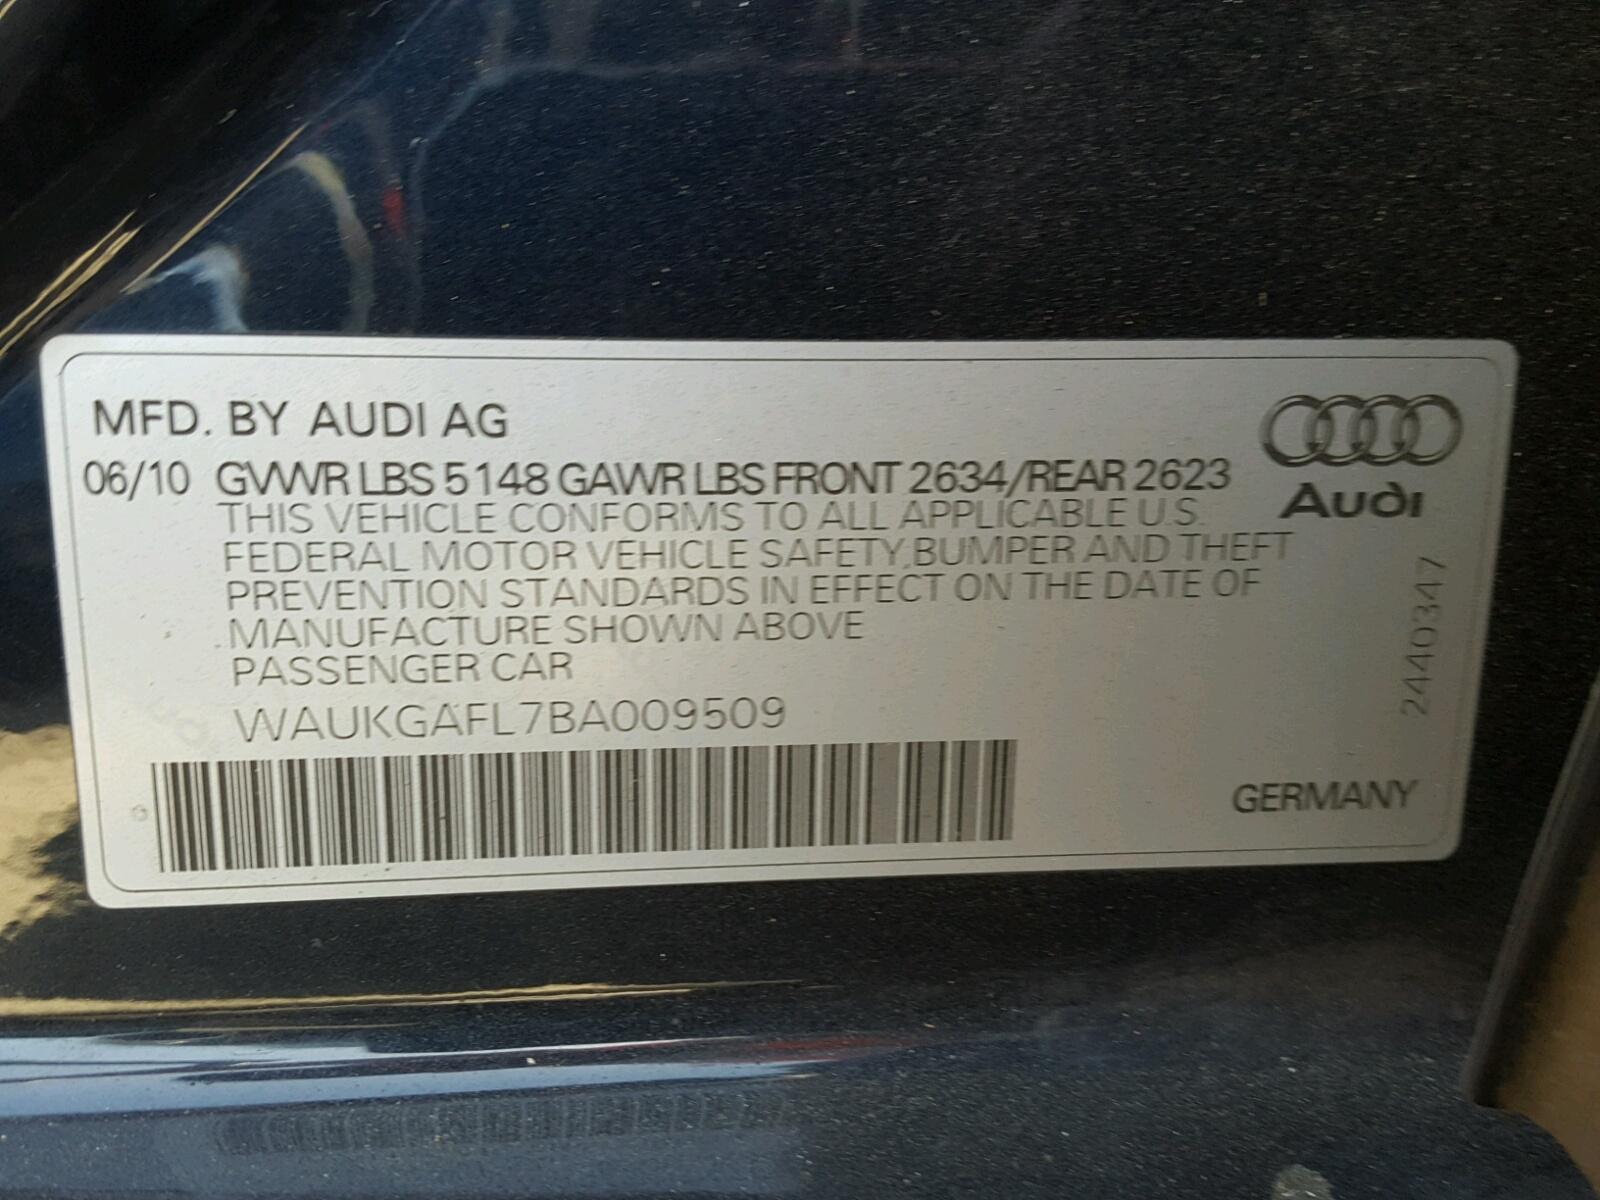 2011 Audi S4 Prestige в продаже Экономия на авто и боРее